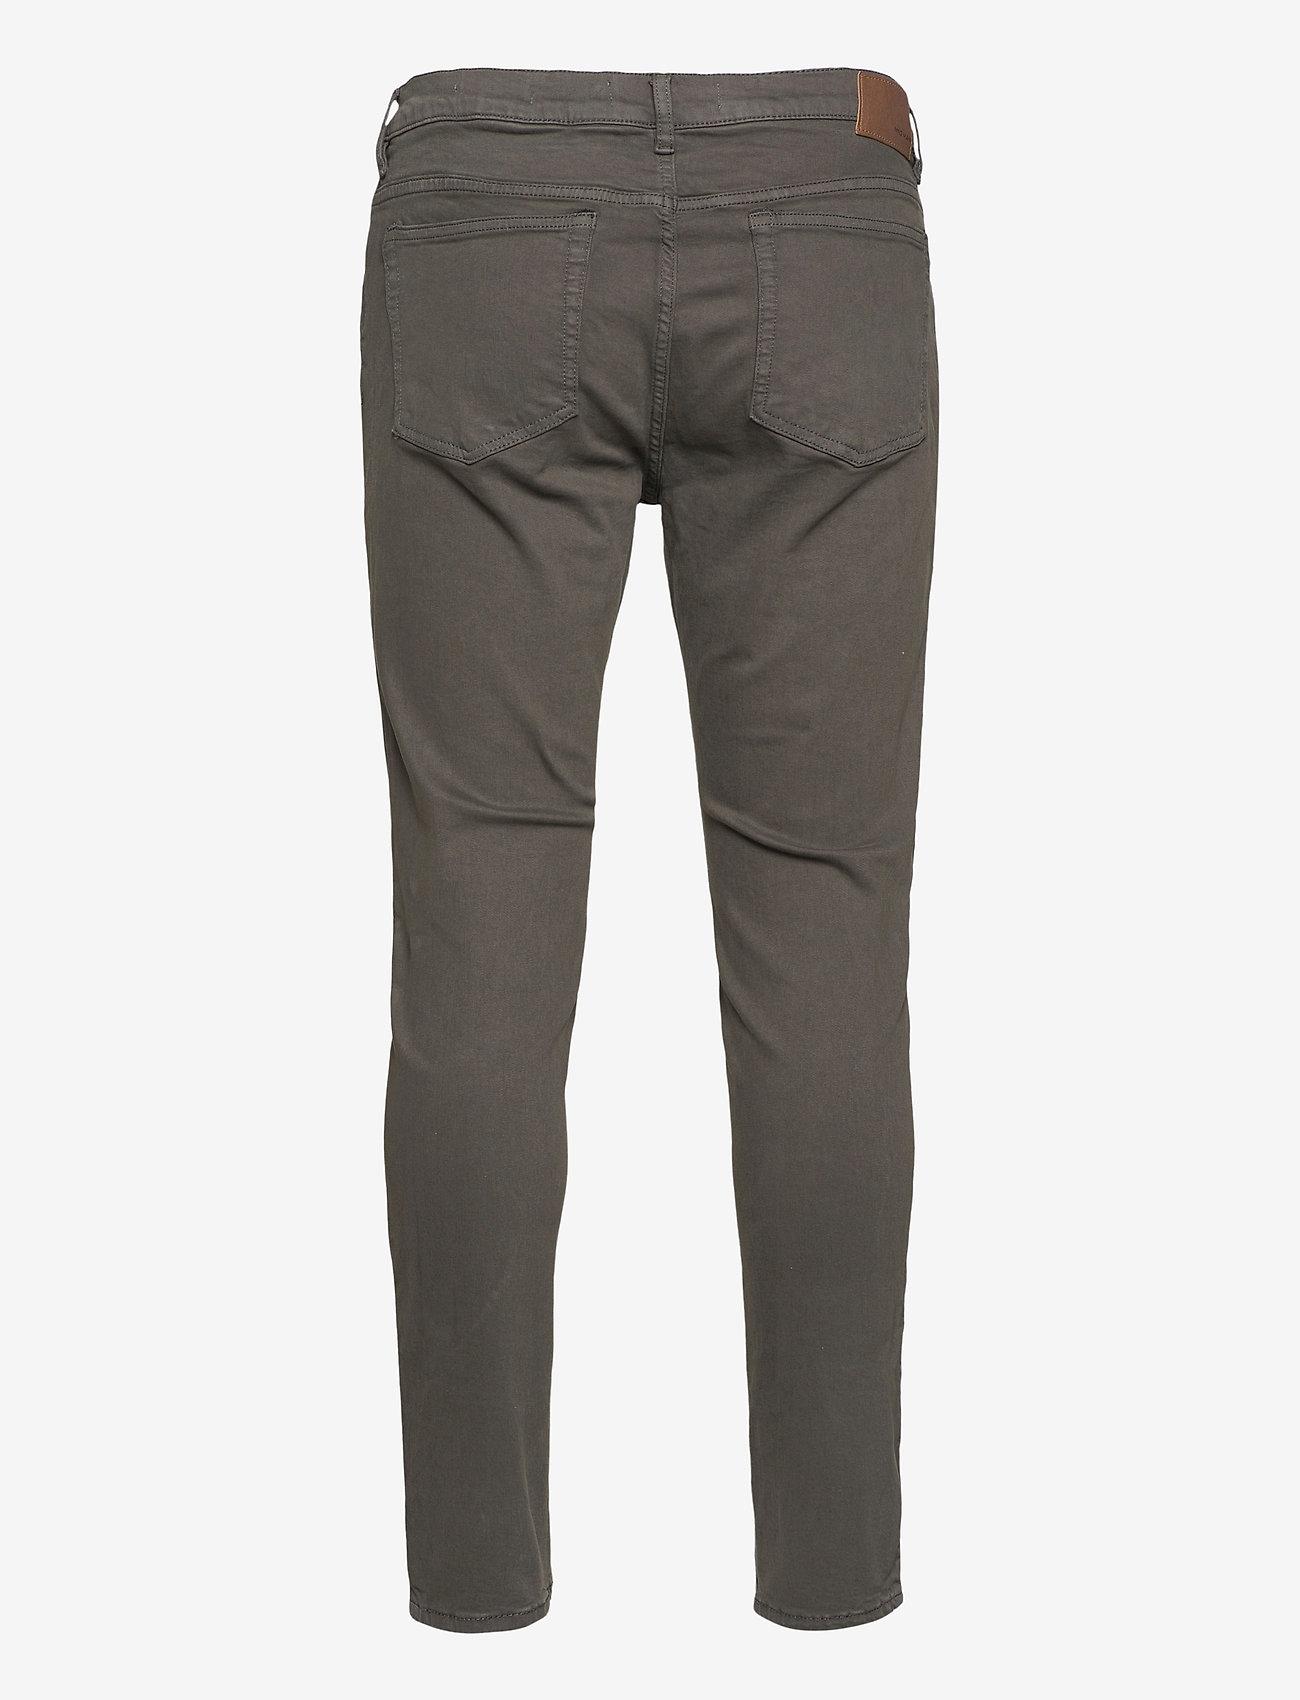 Mango BILLY - Jeans GREY - Menn Klær